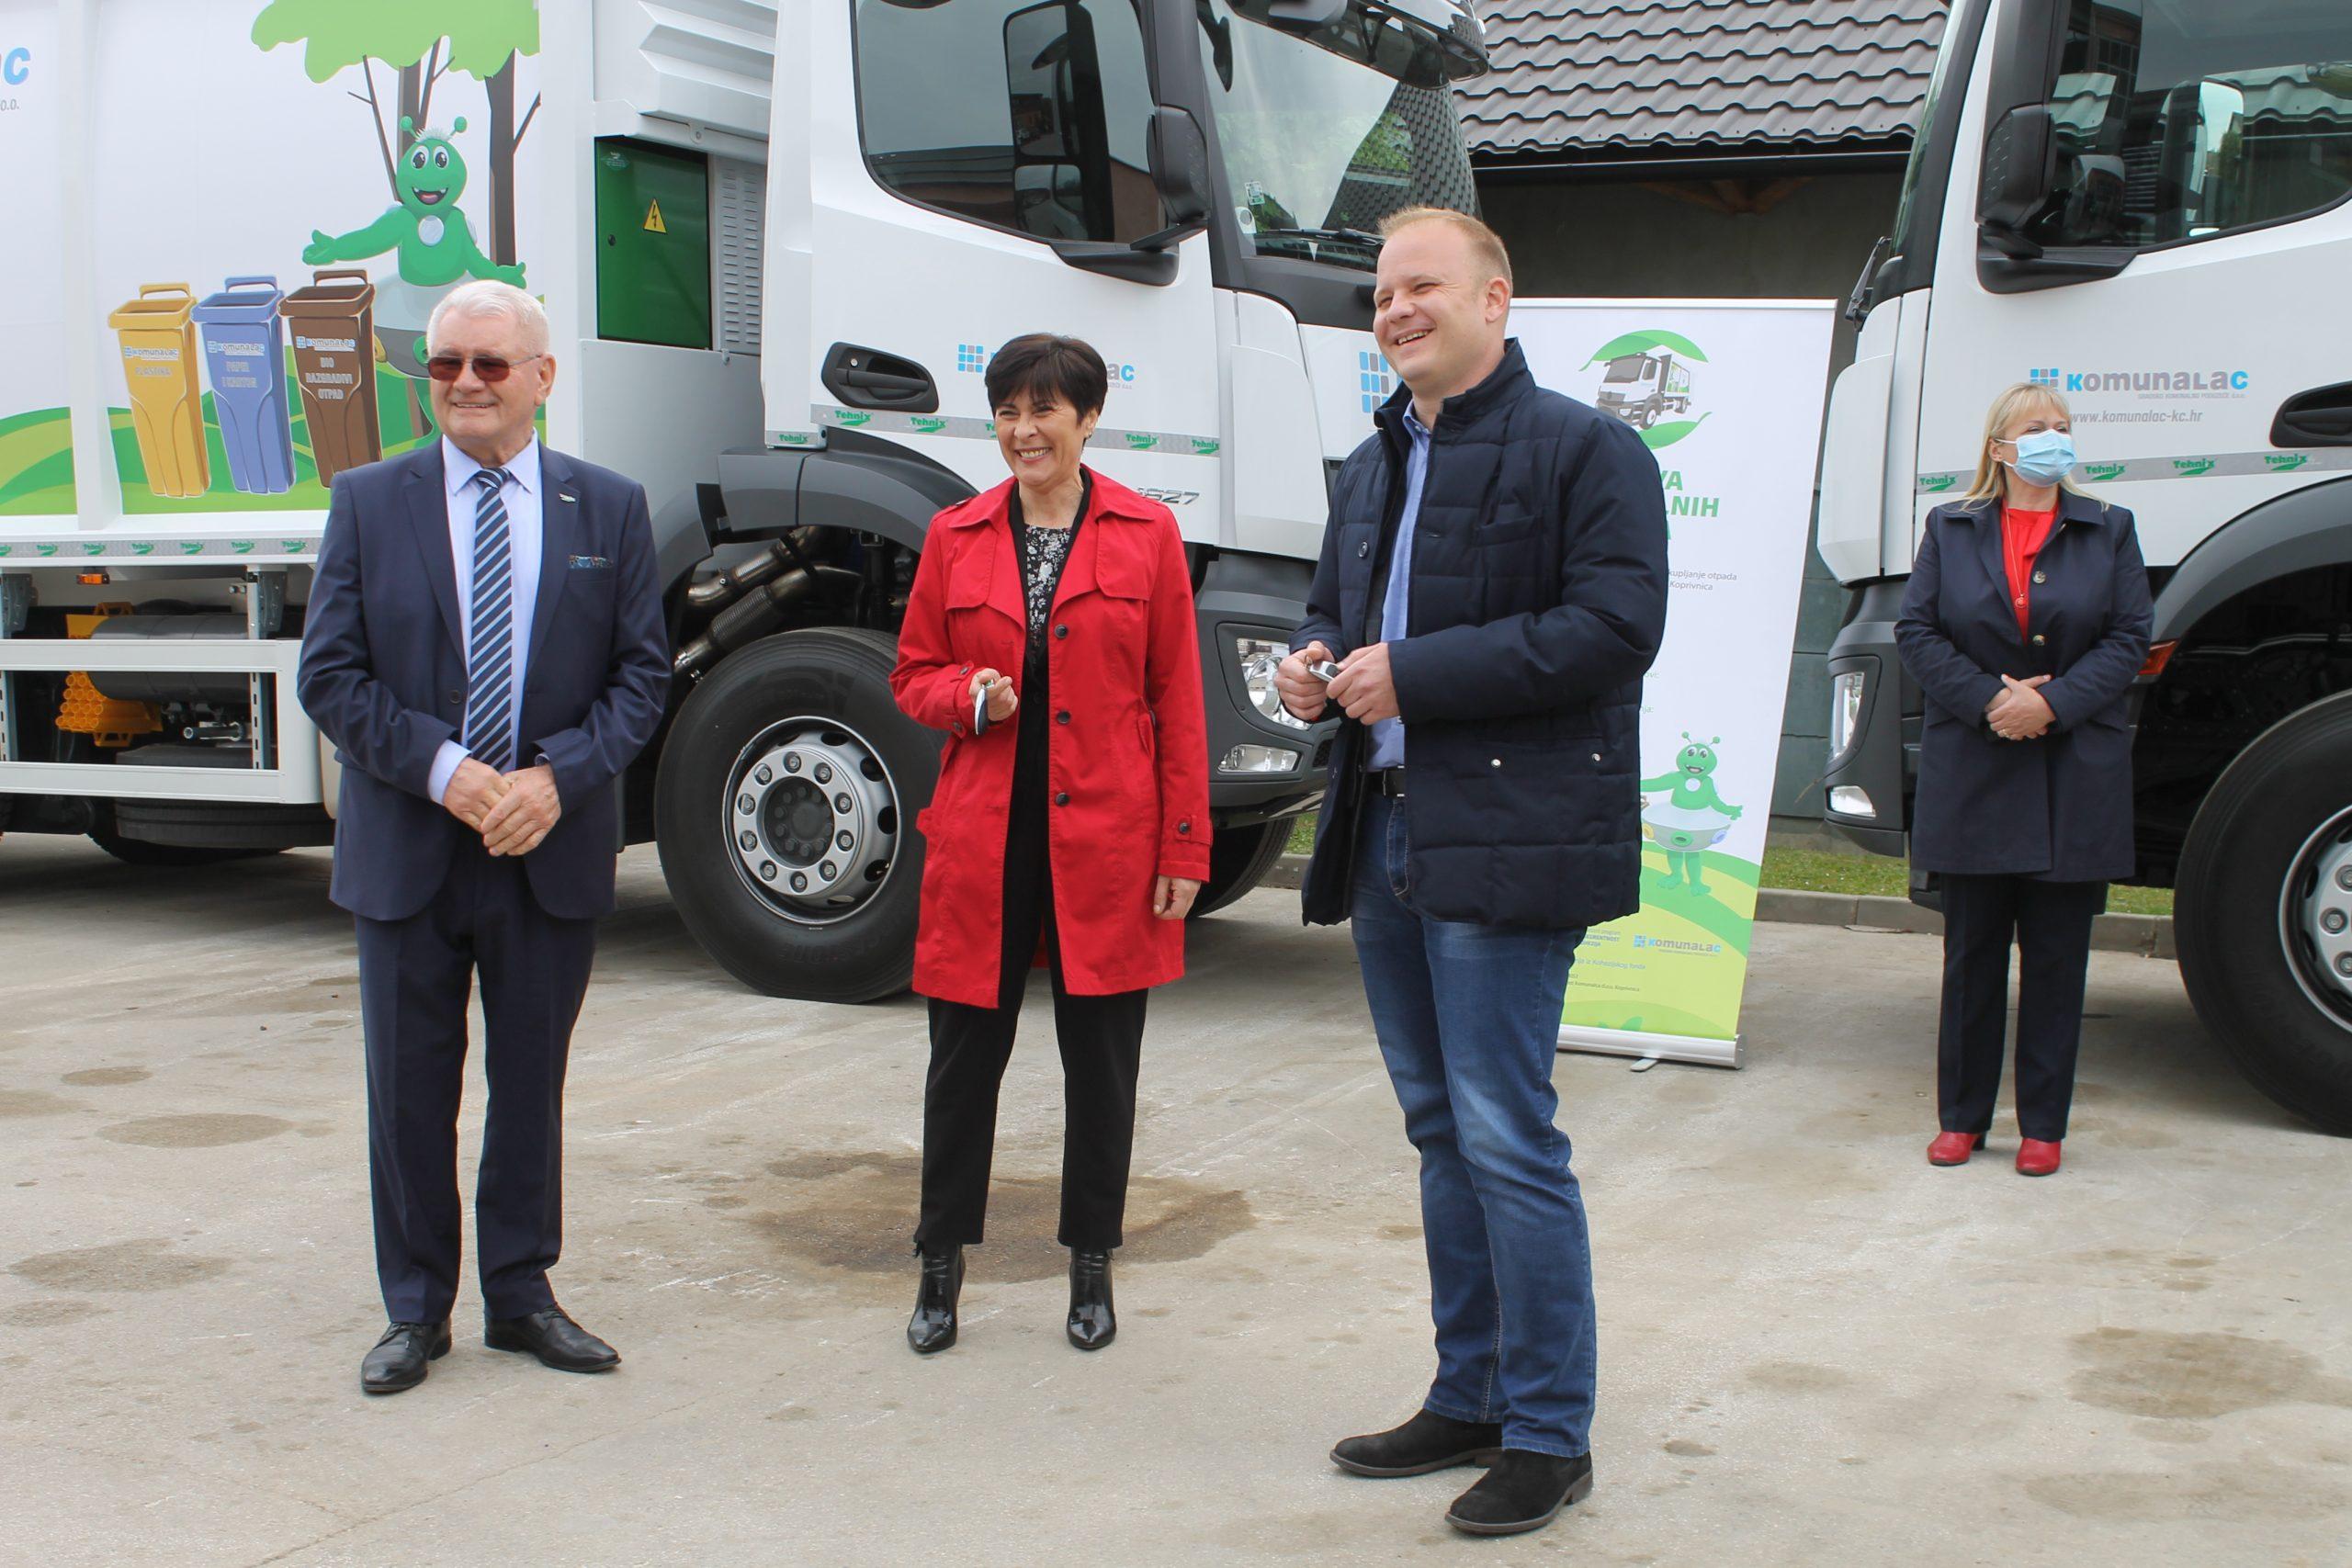 Dva nova komunalna vozila za odvojeno prikupljanje otpada predstavljena javnosti